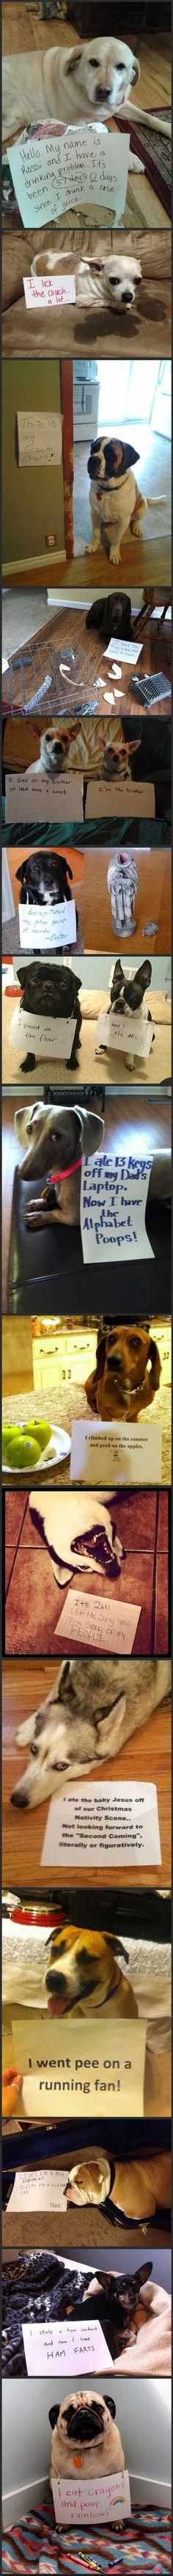 Dog shaming, part 99 - http://limk.com/news/dog-shaming-part-99-081363963/